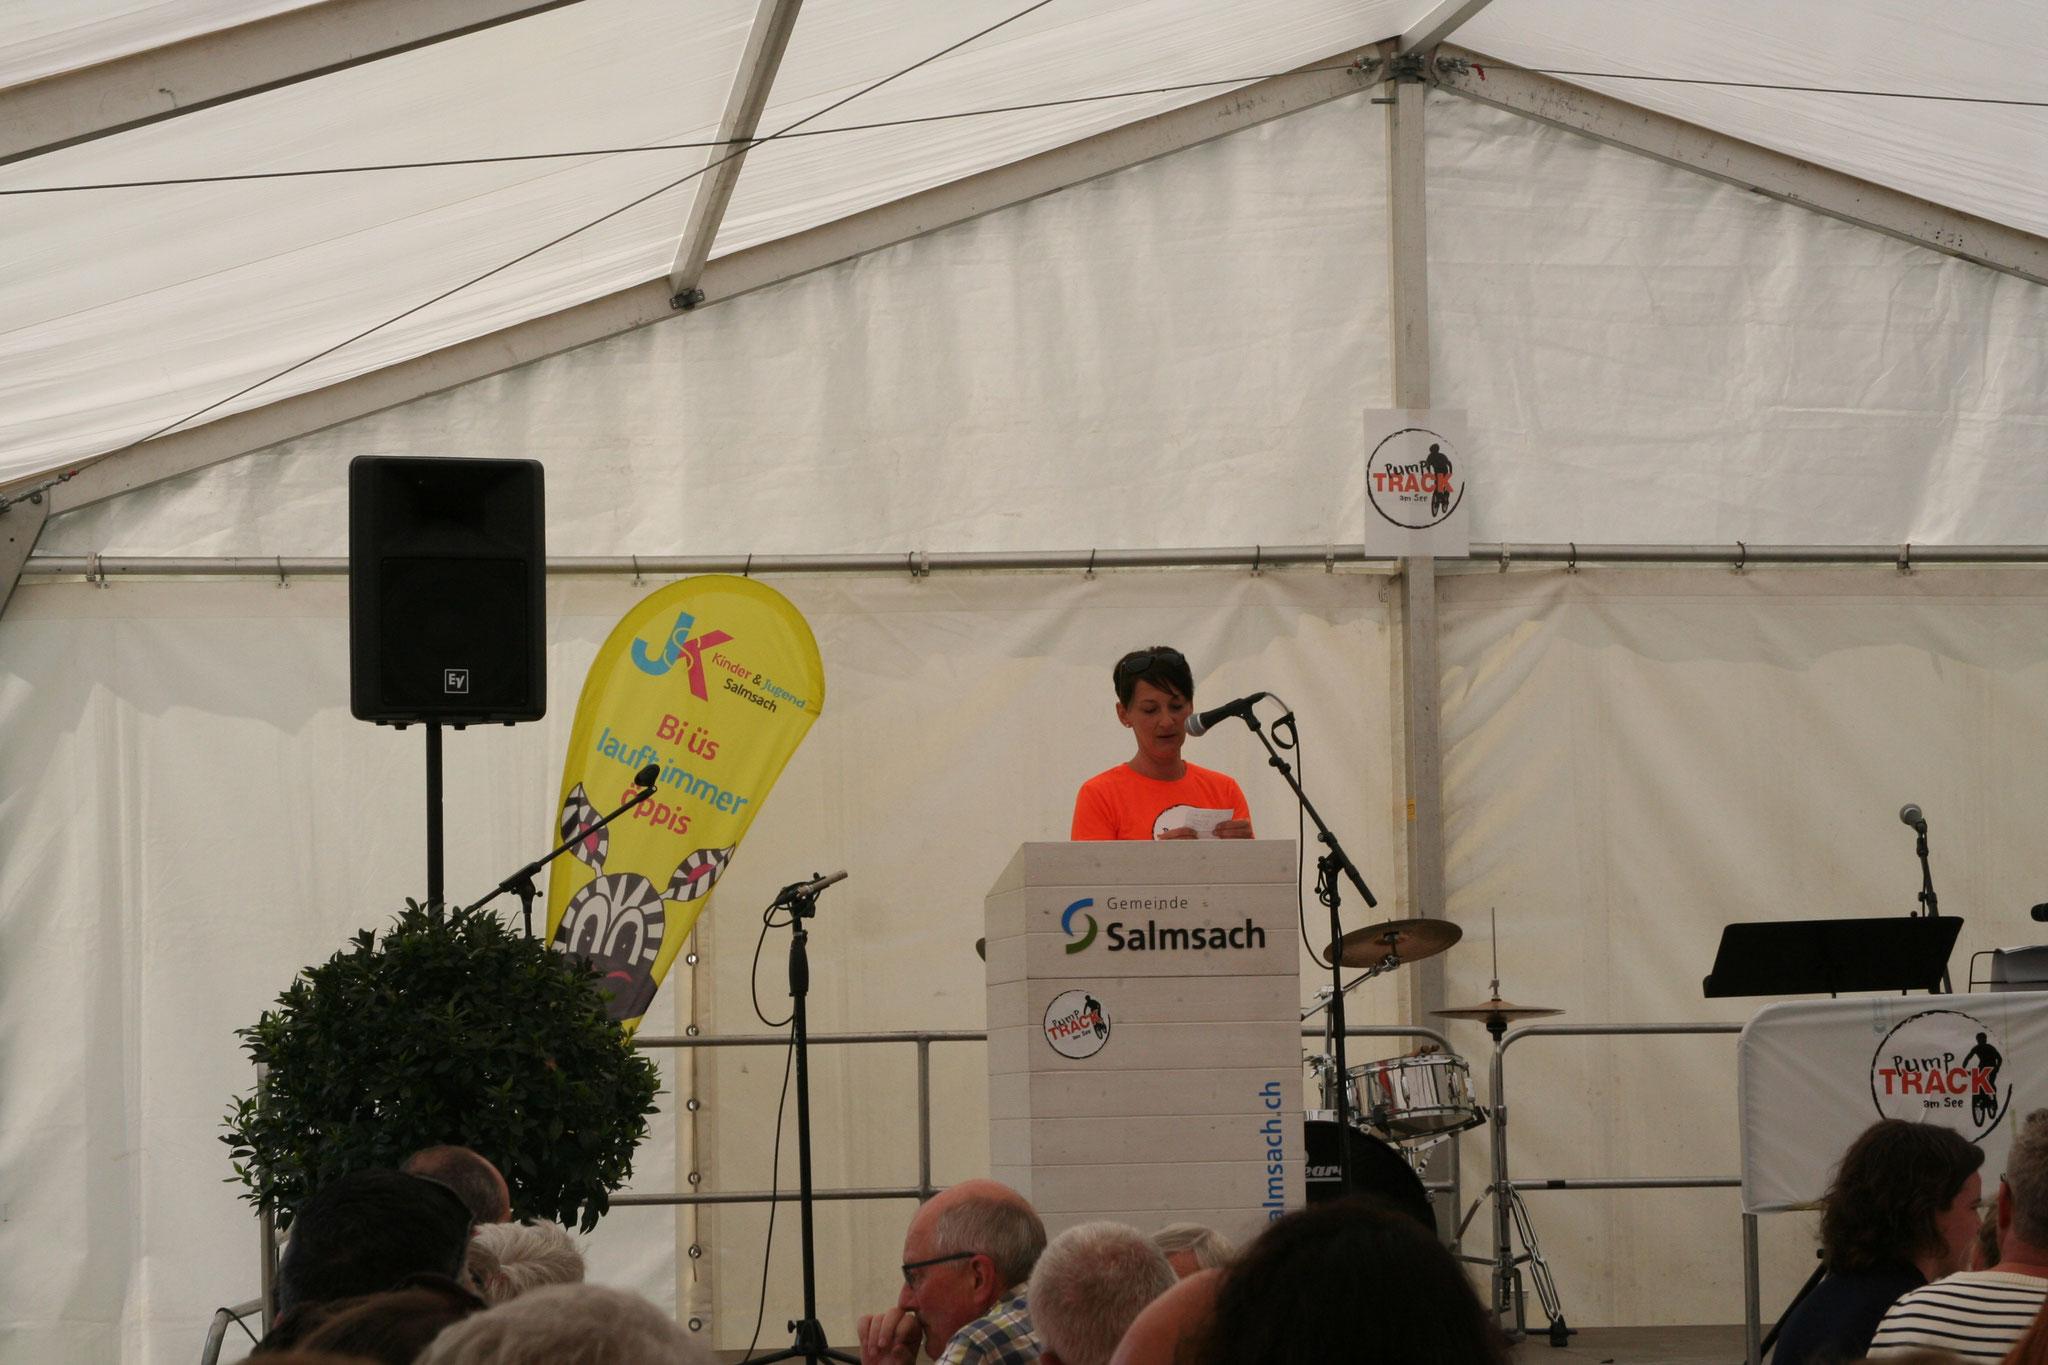 Projektgruppe Pumptrack am See, Salmsach, Eröffnungsfeier